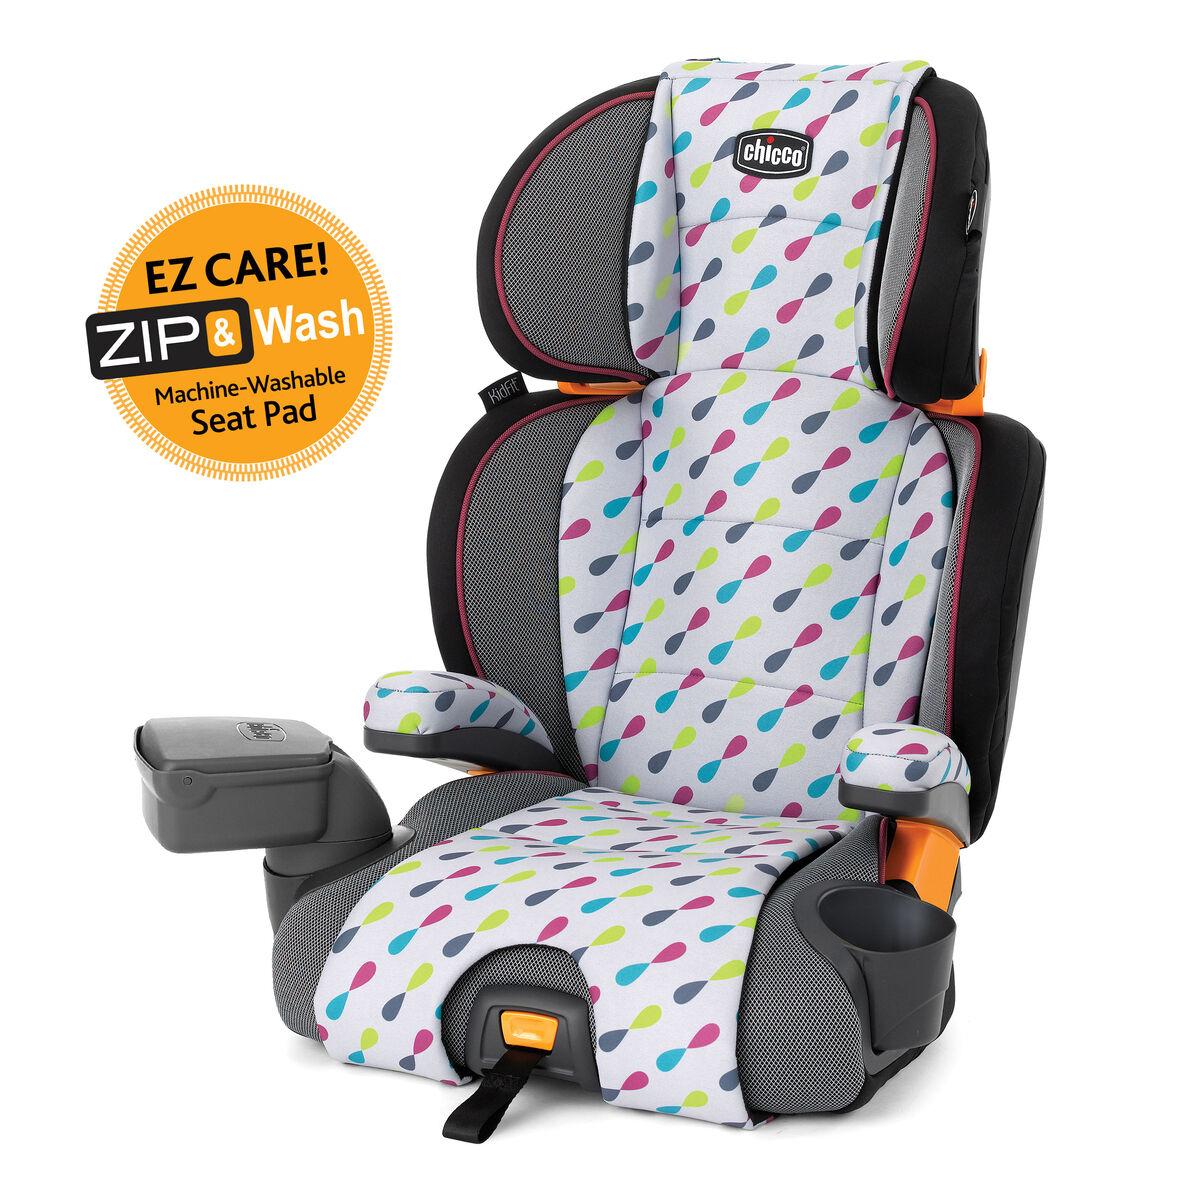 Kidfit zip 2 in 1 belt positioning booster car seat gemkidfit 2 in 1 belt positioning booster car seat gem